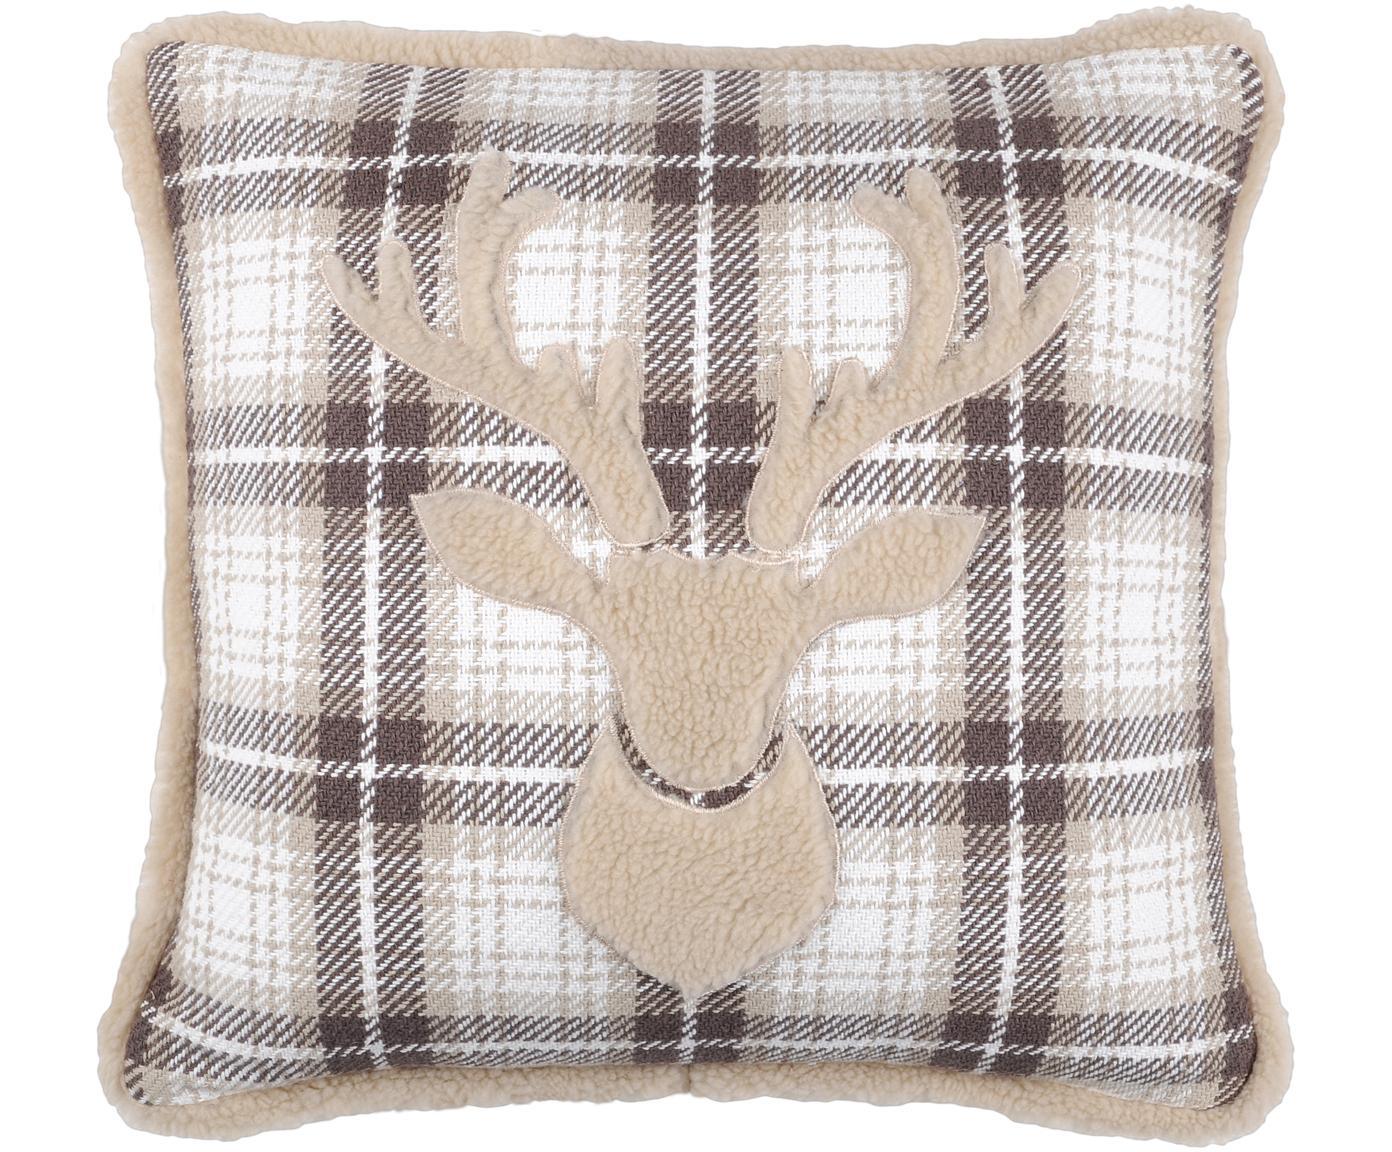 Cojín Timber, con relleno, Funda: 50%algodón, 32%lana, 7%, Gris, blanco, beige, An 40 x L 40 cm